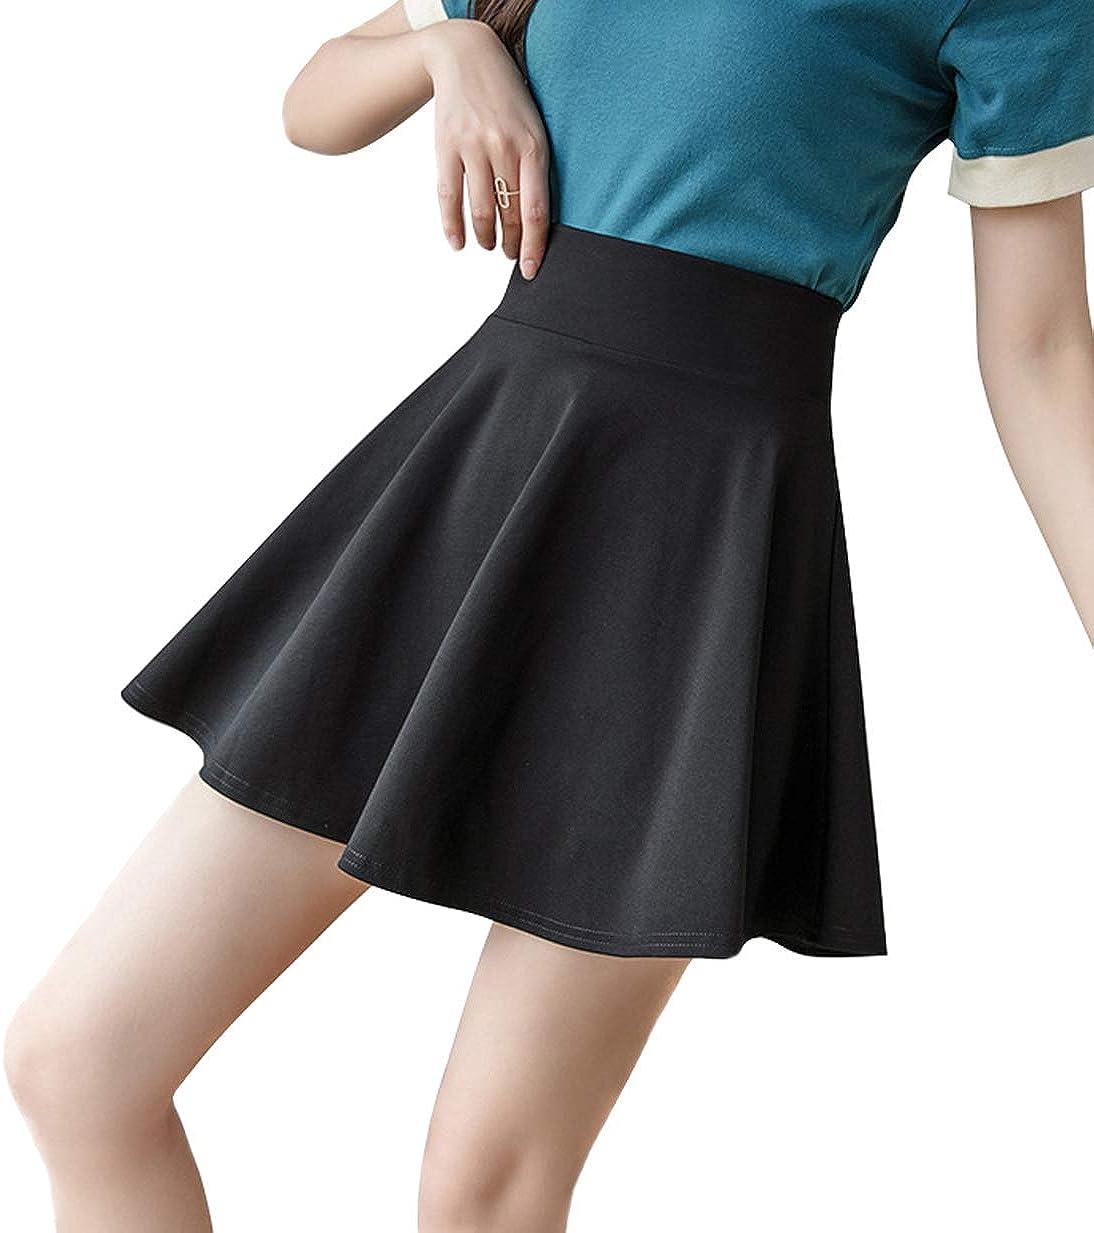 Mandy Luv Women's Elastic Waist Basic Versatile Stretchy Flared Pleated Casual Skater Mini Skirt